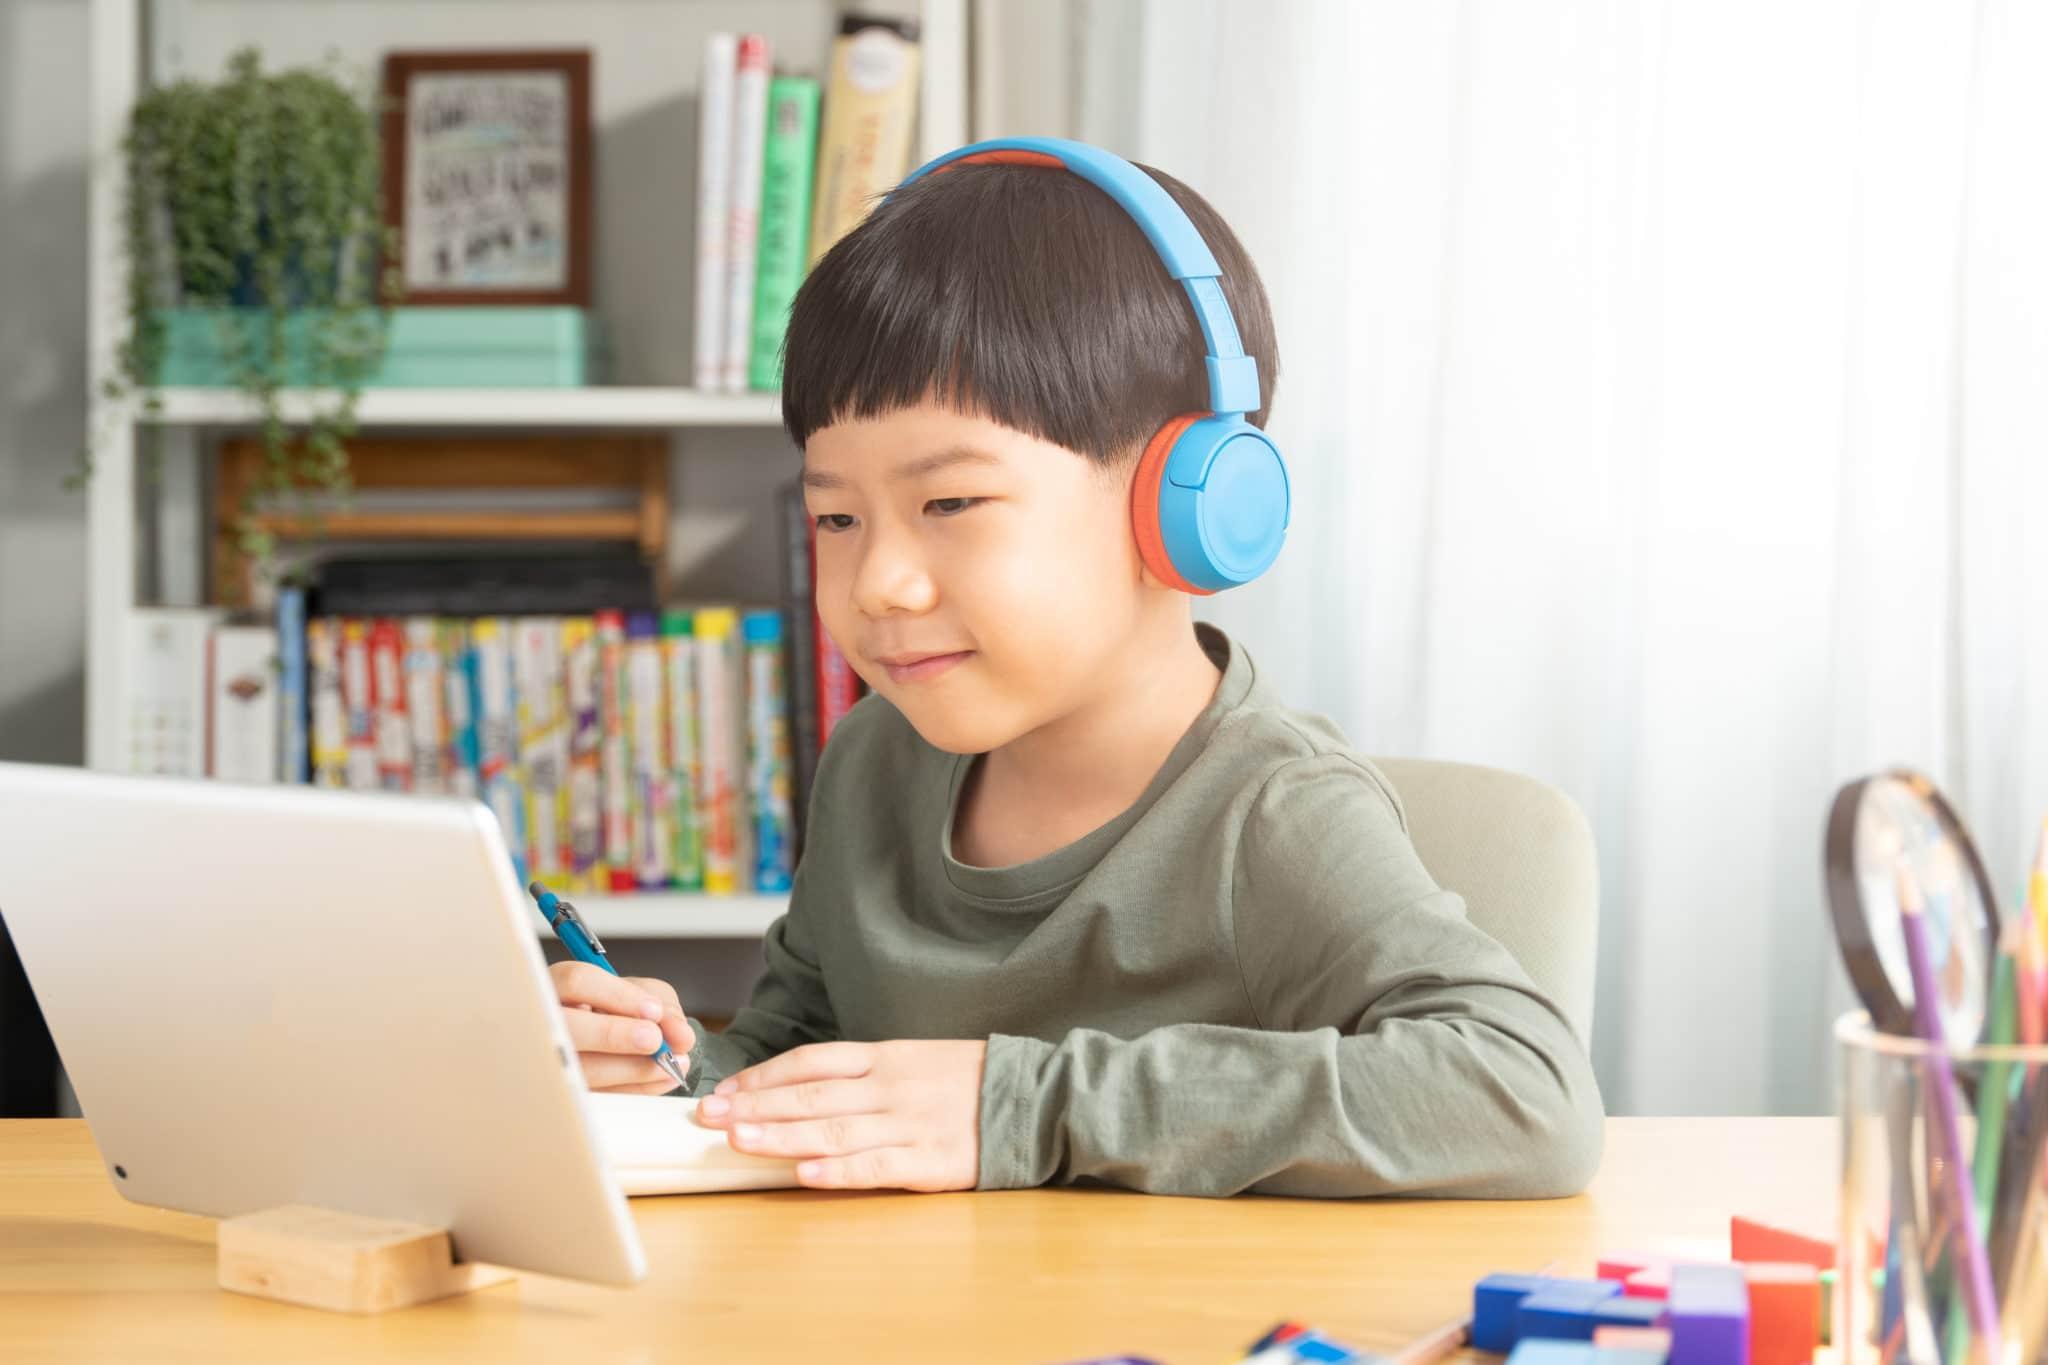 young boy smiles at computer